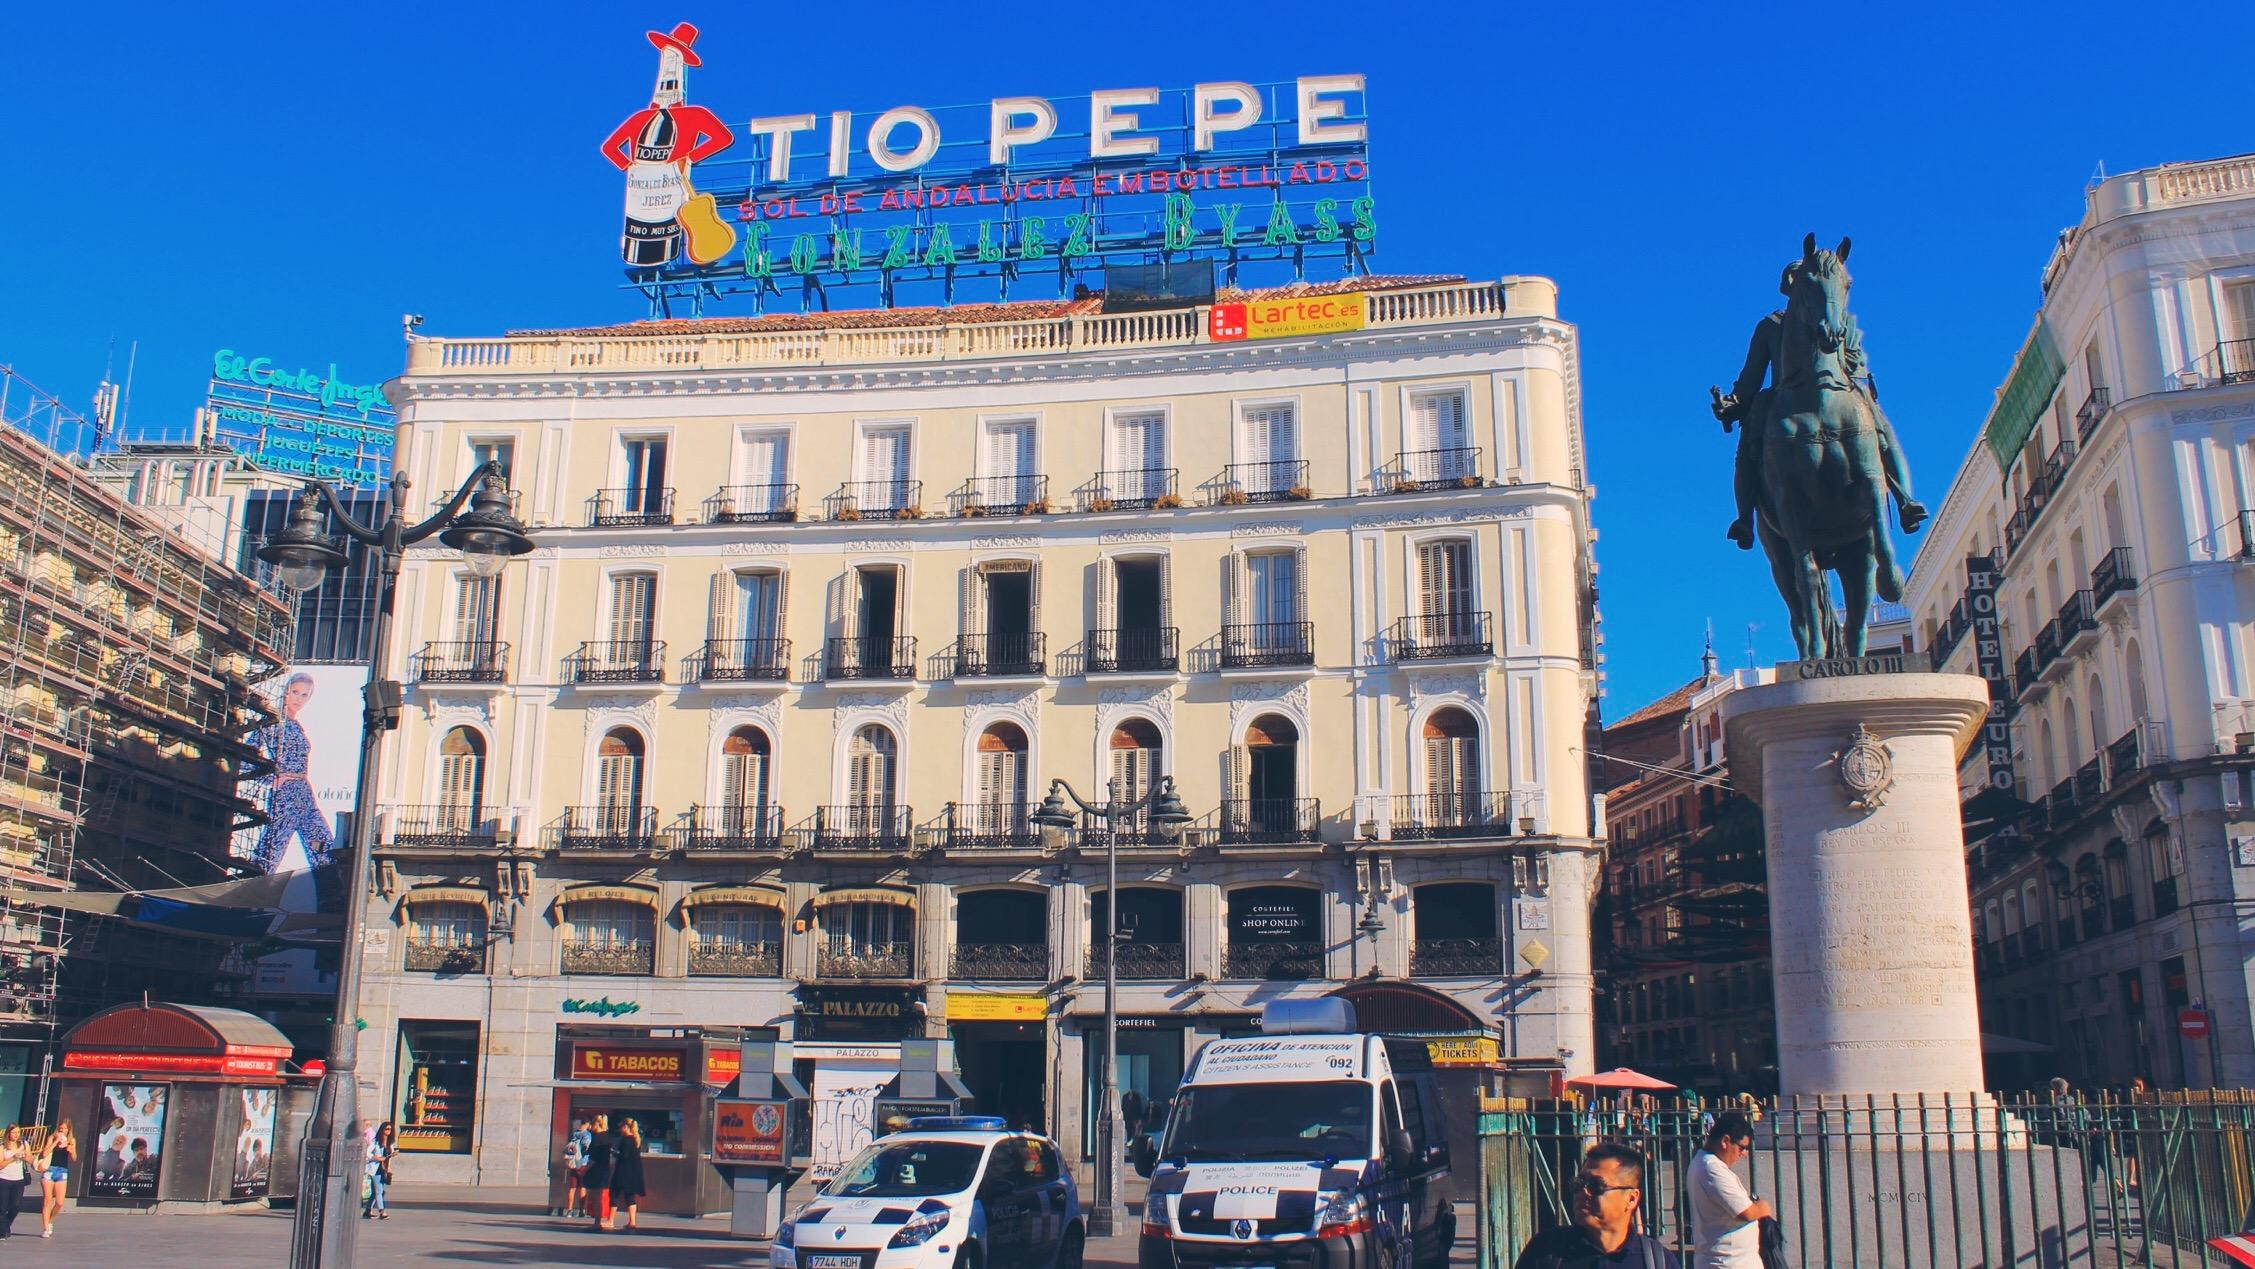 La Puerta del Sol, Madrid, Spain